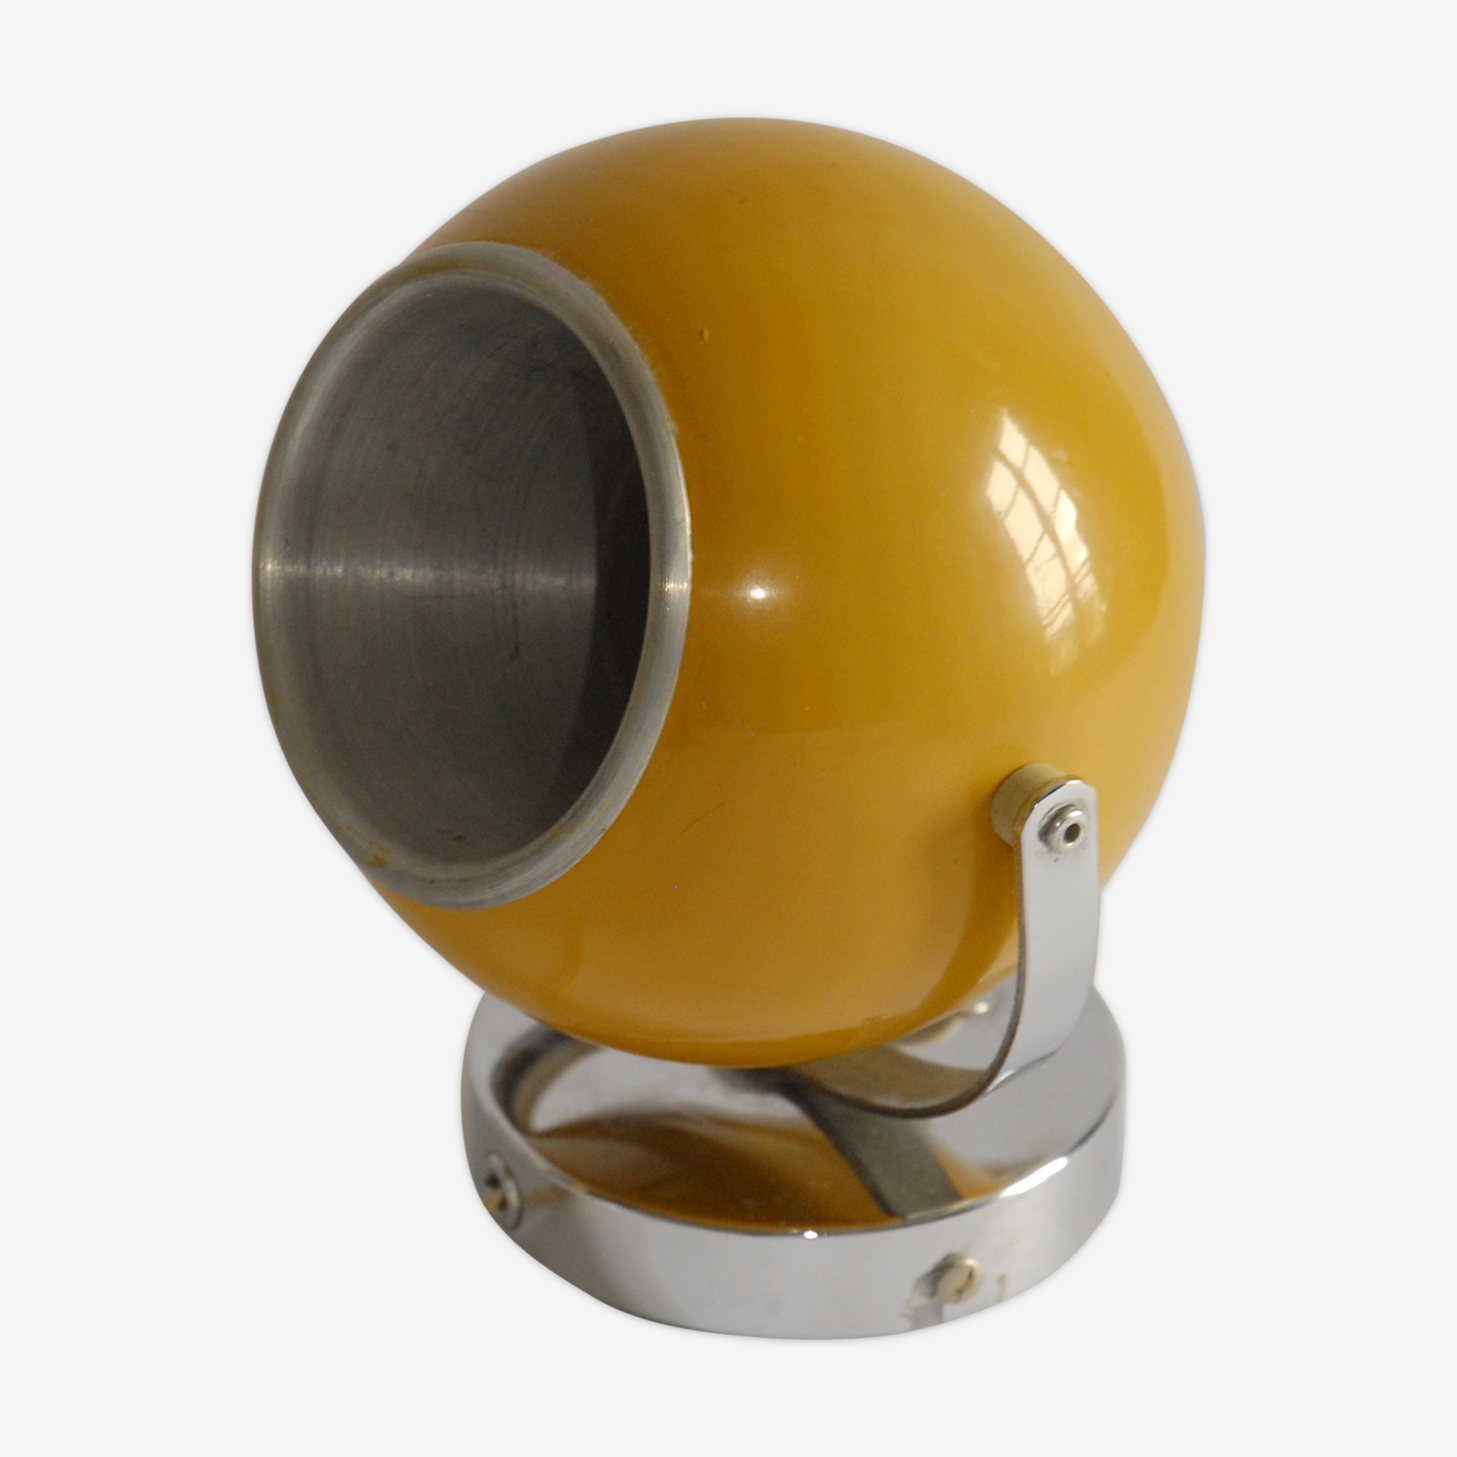 Applique eye ball -spage age- années 60